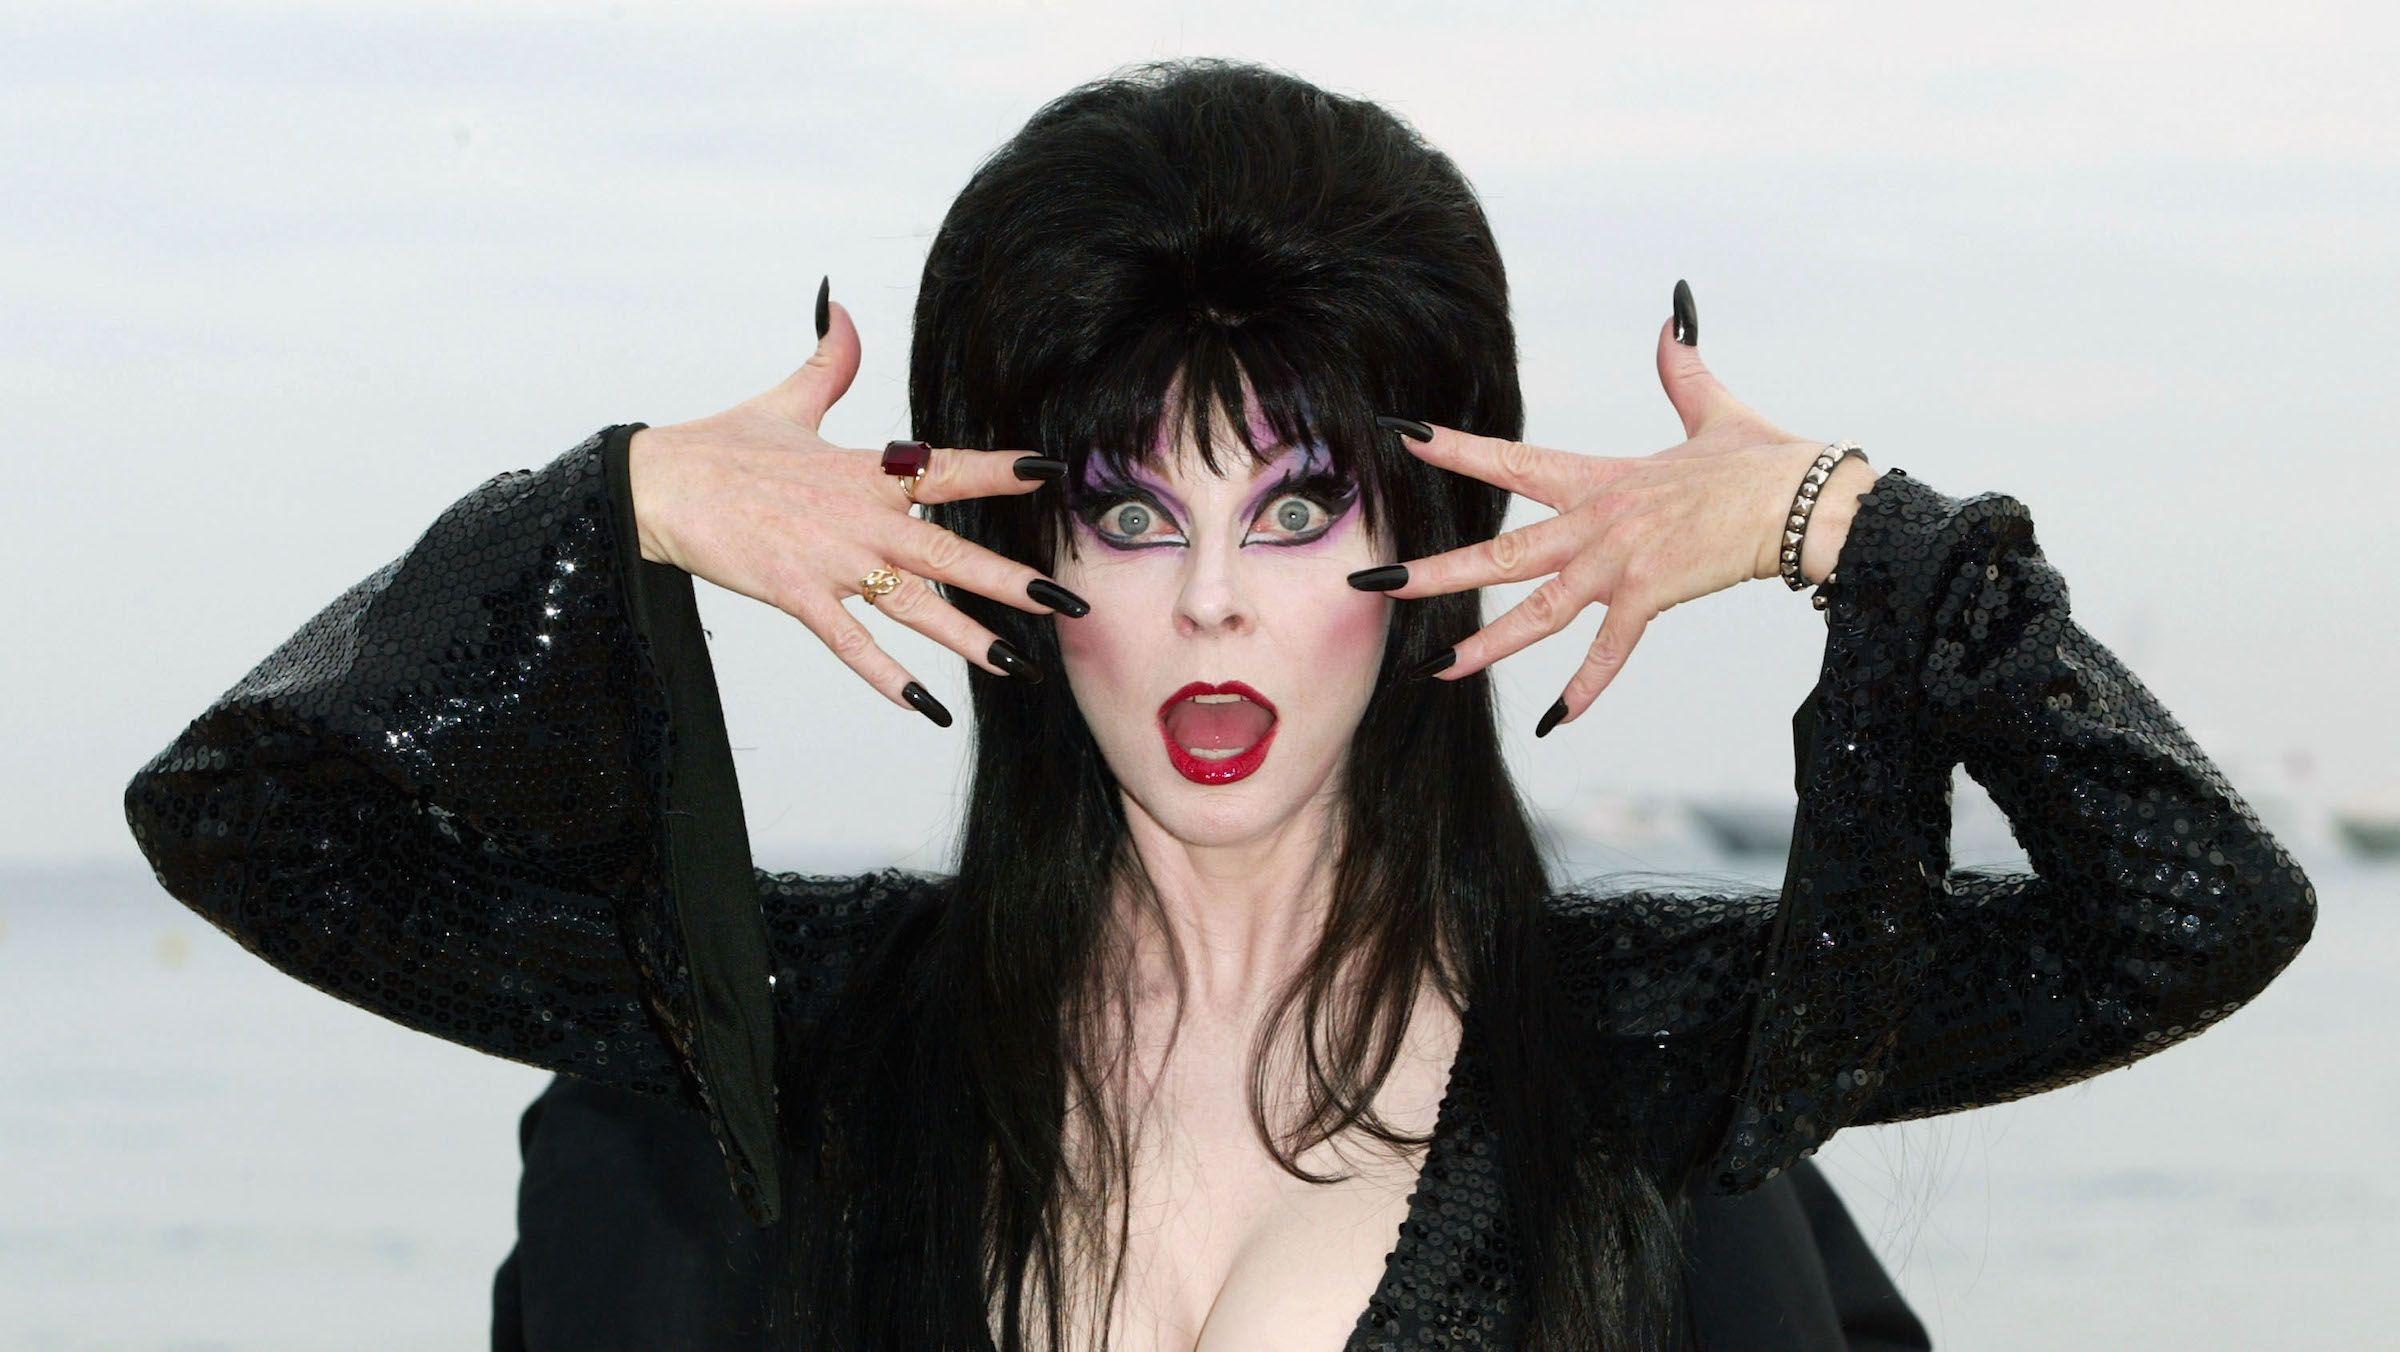 14 Fiendish Facts About Elvira, Mistress of the Dark